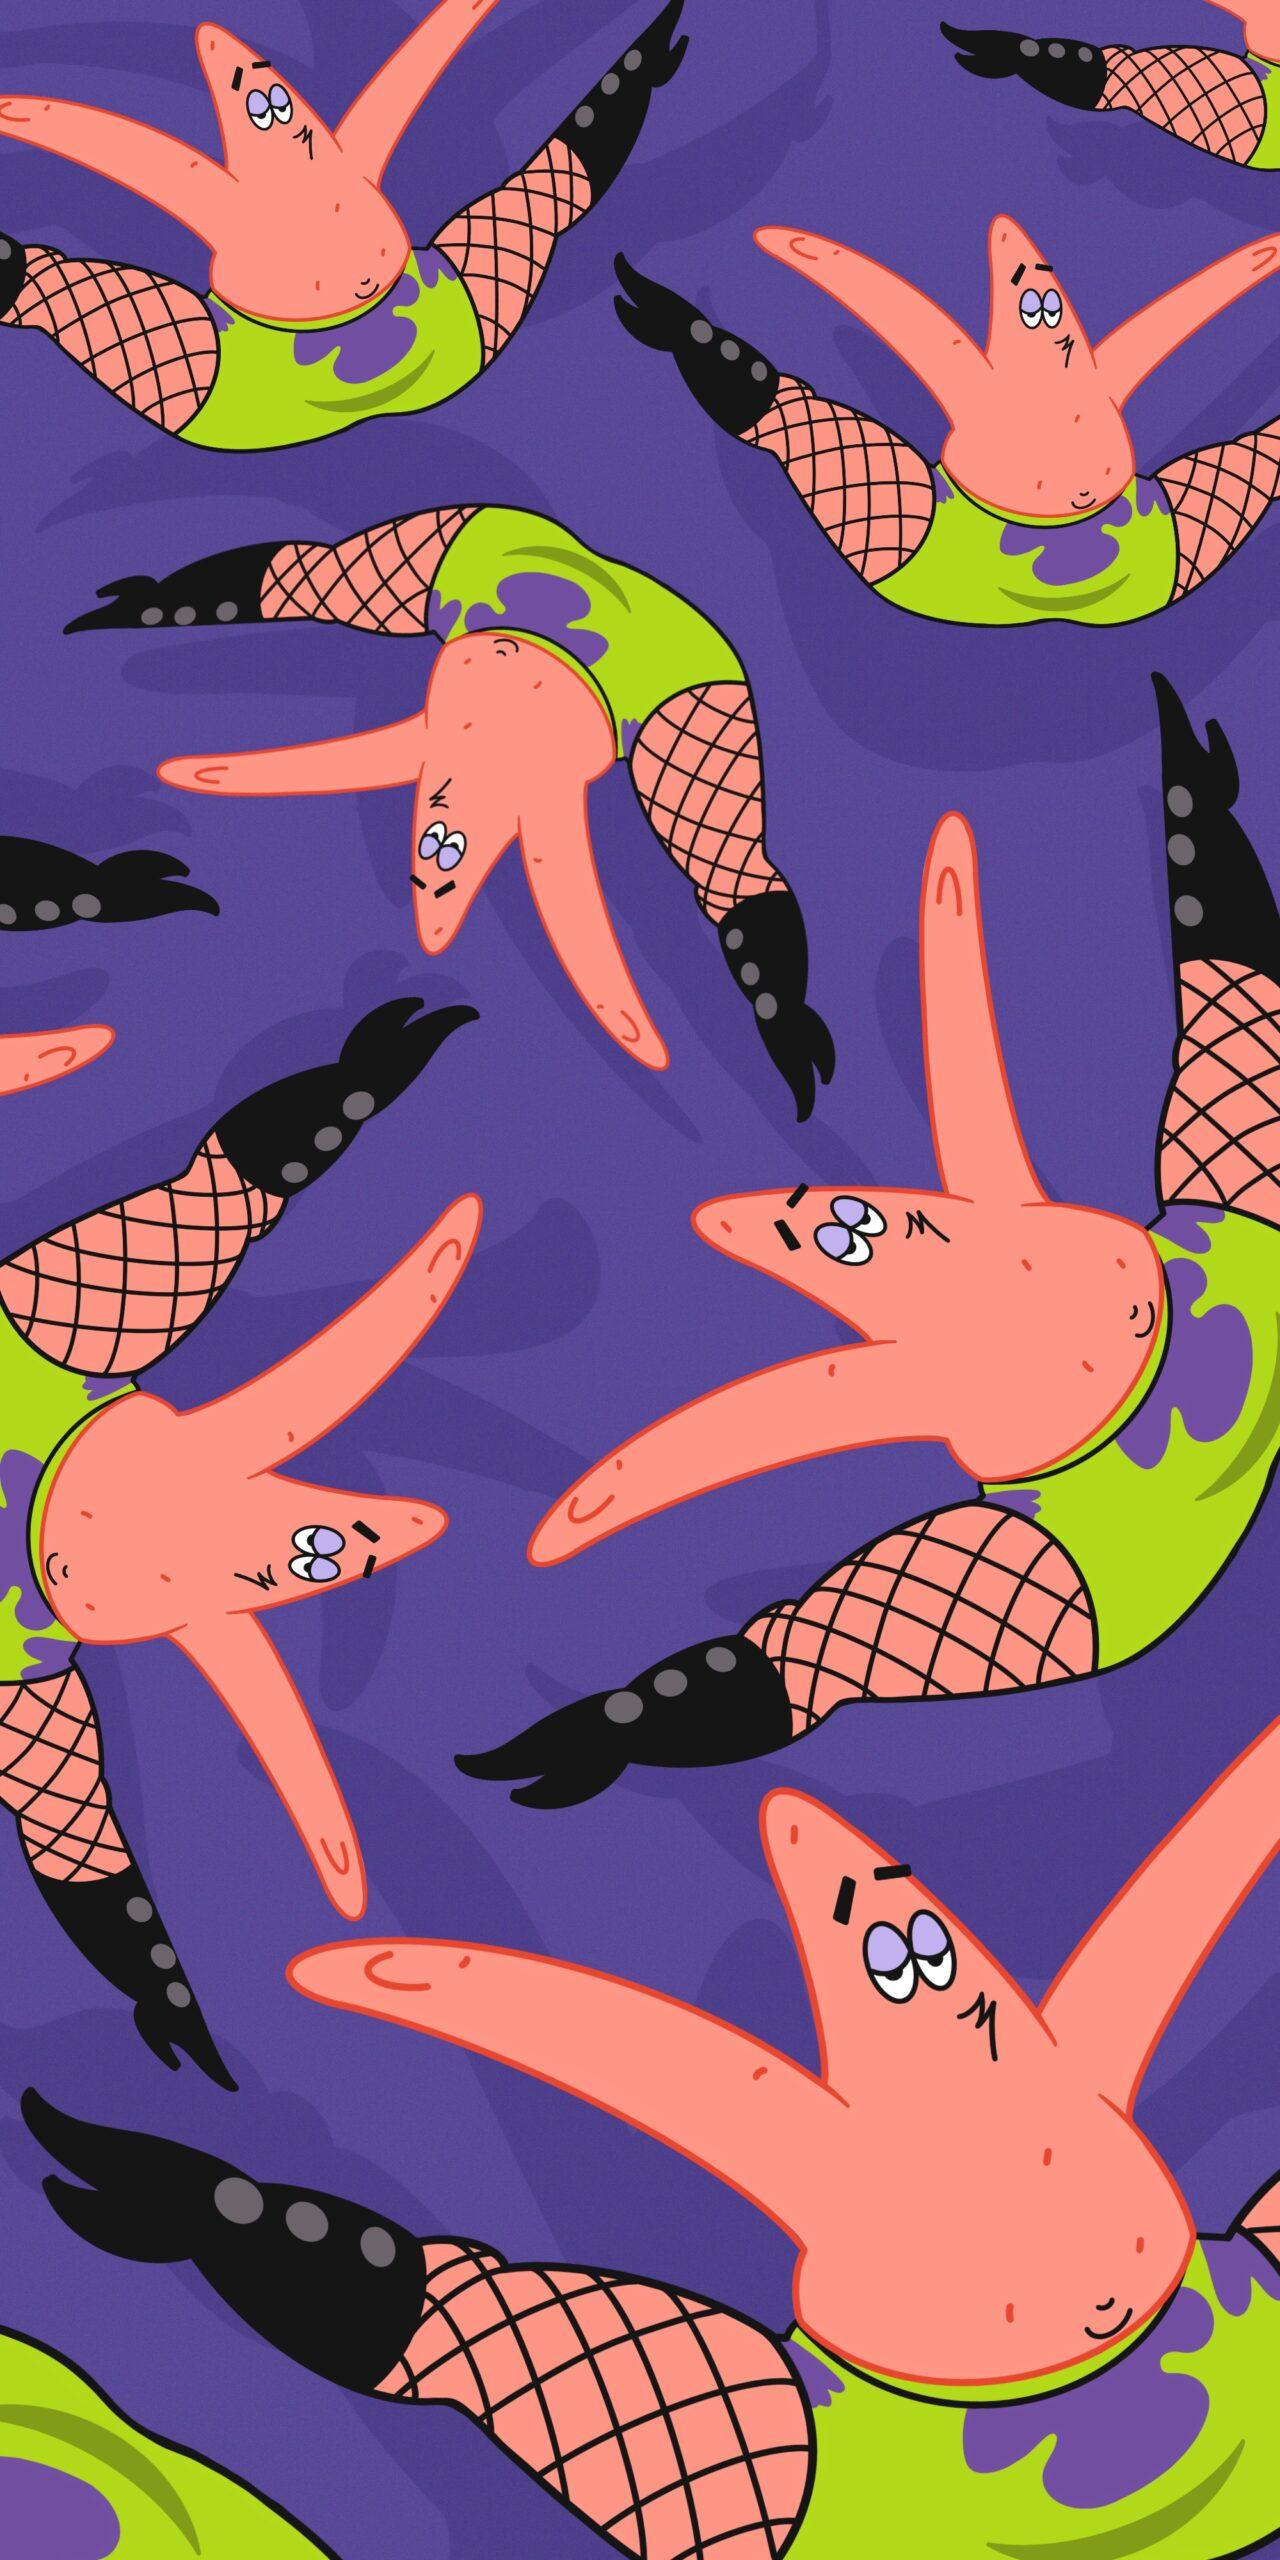 spongebob patrick star fishnet stockings wallpaper